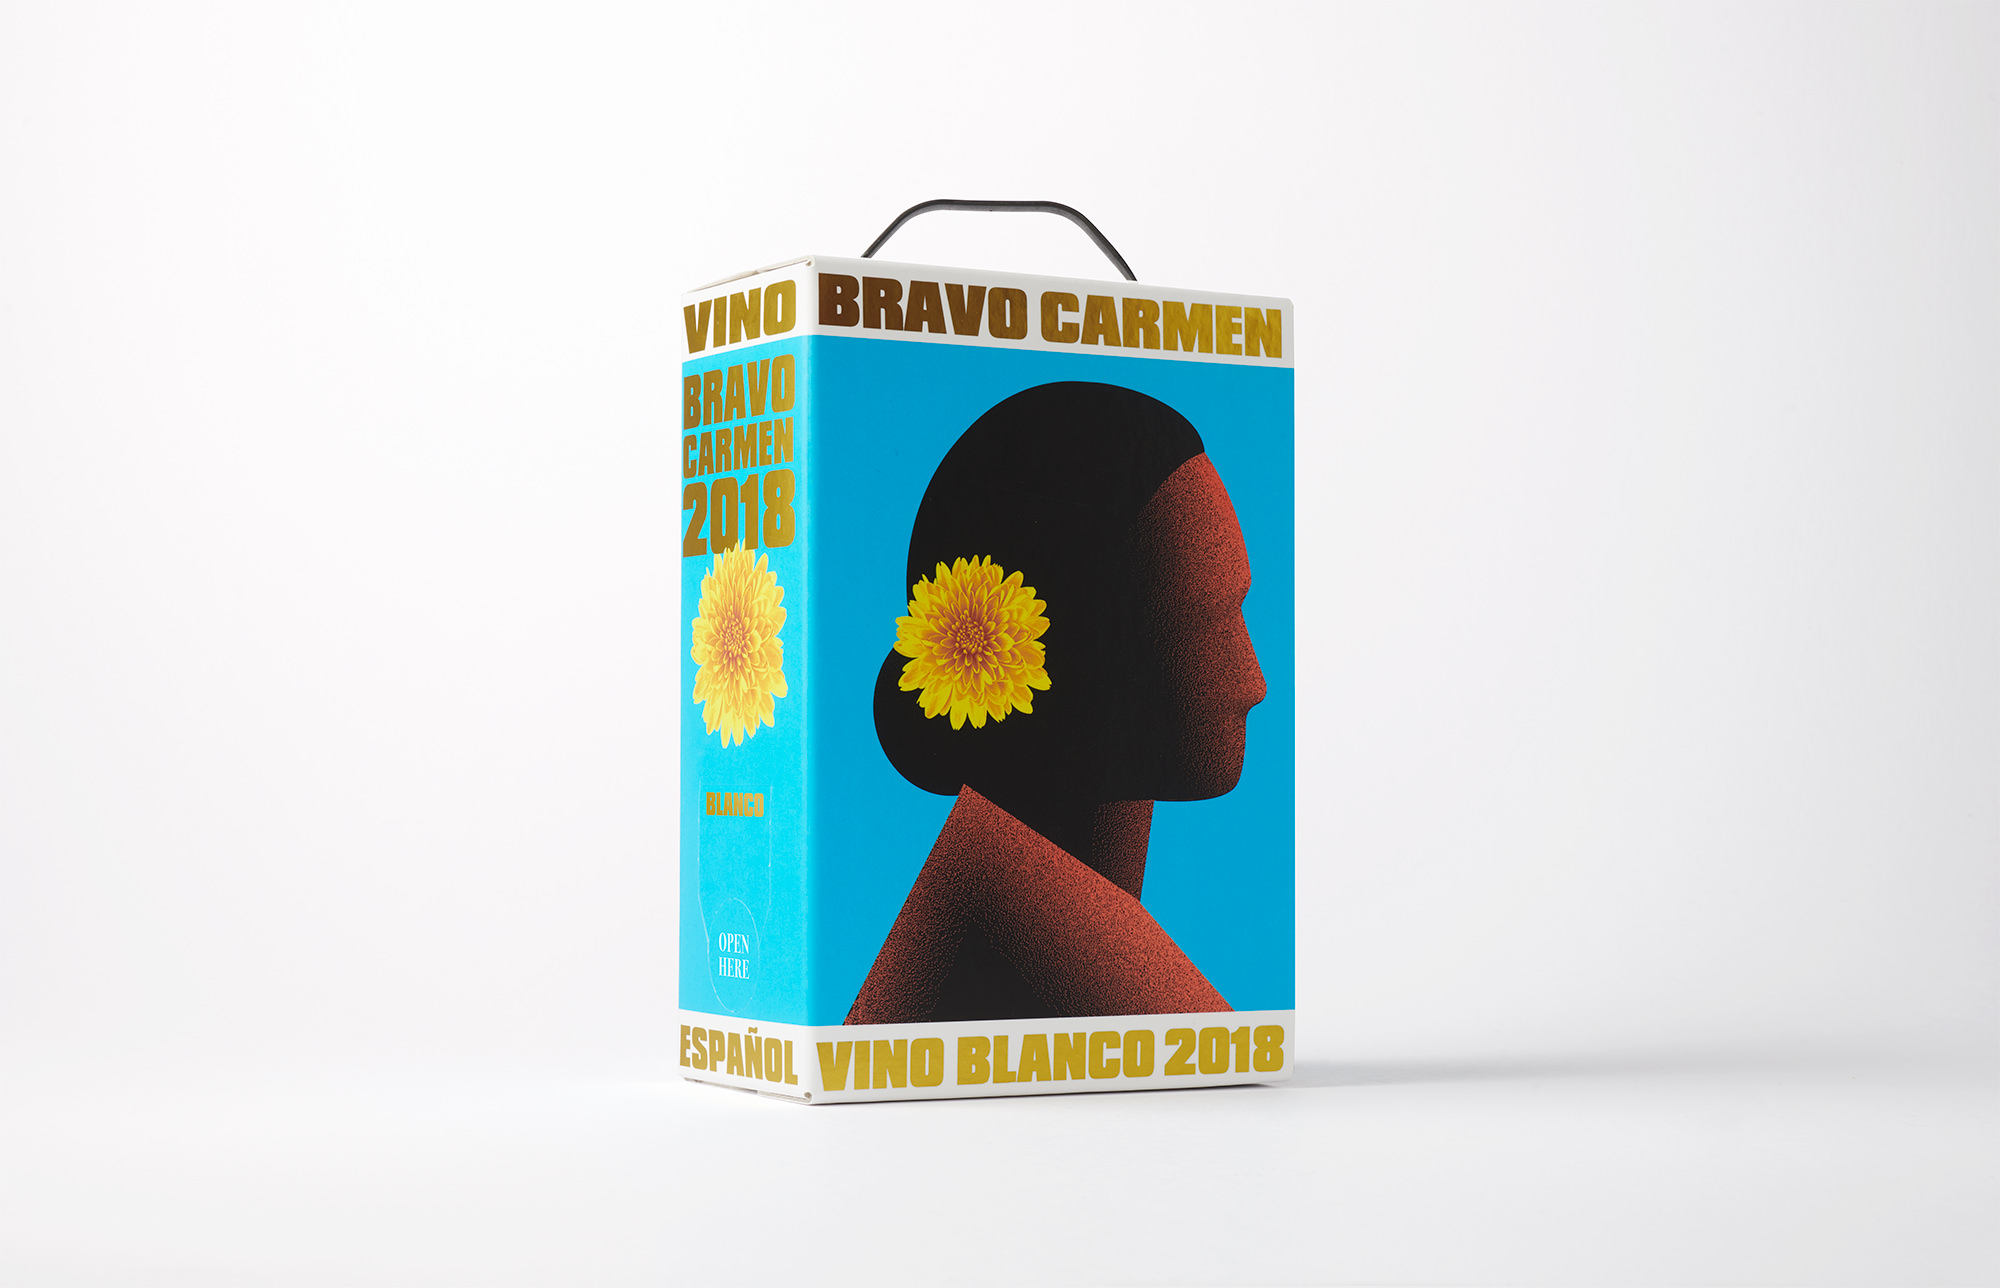 BRAVO CARMEN2